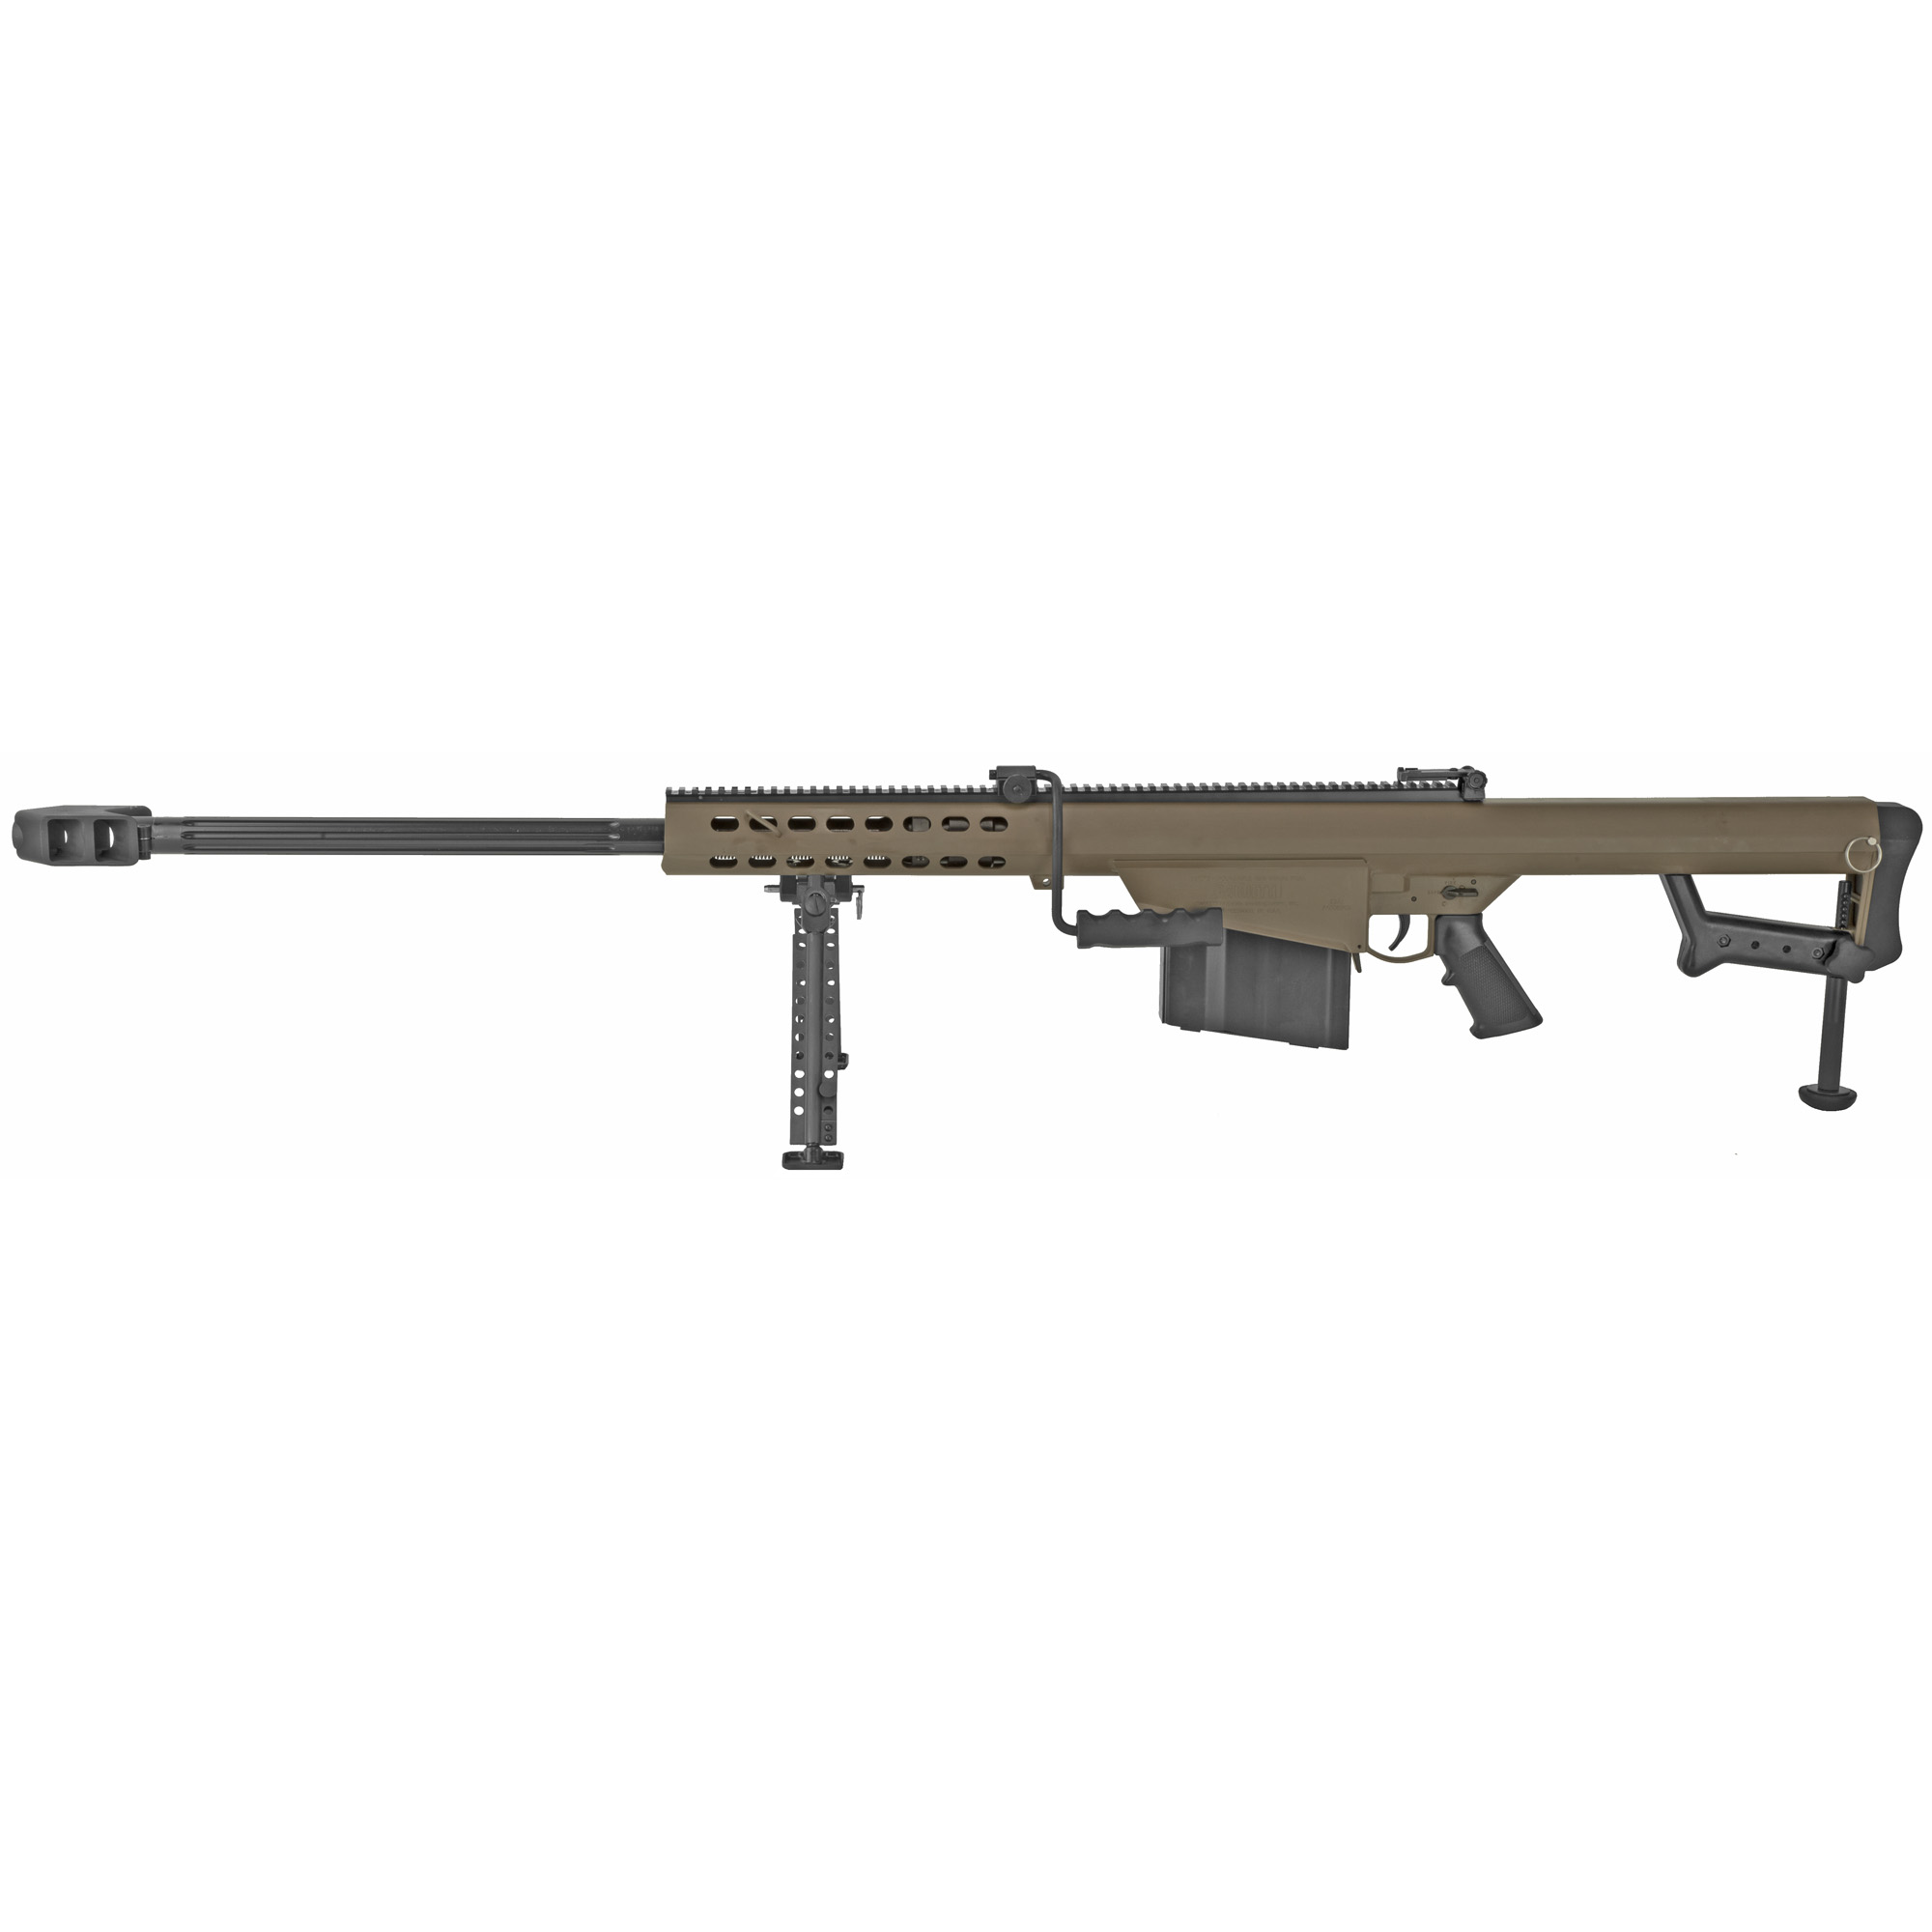 "Barrett 82a1 416b Semi 29"" Coy"